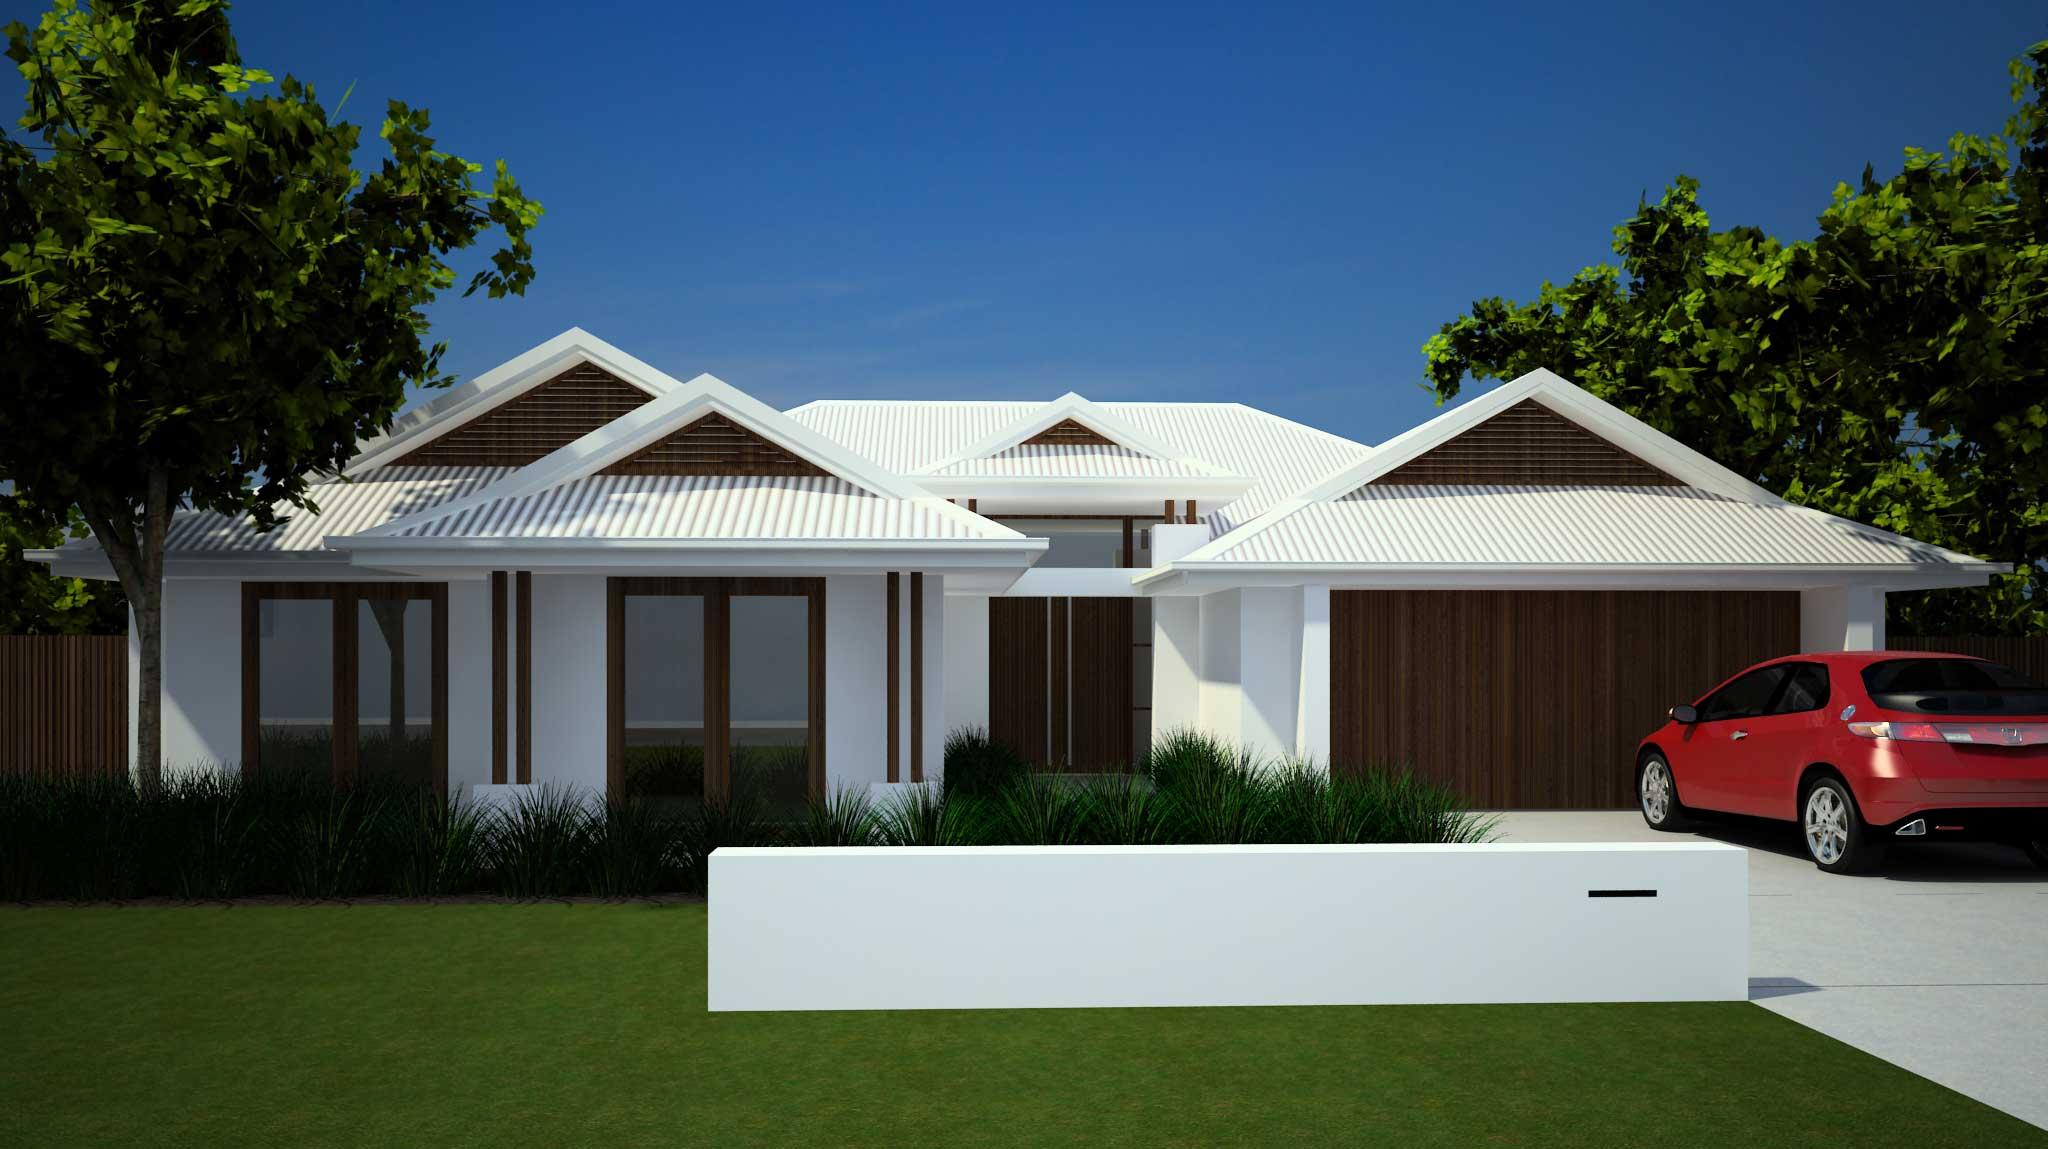 Architecture Design Modern Ideas House House Plans 40846